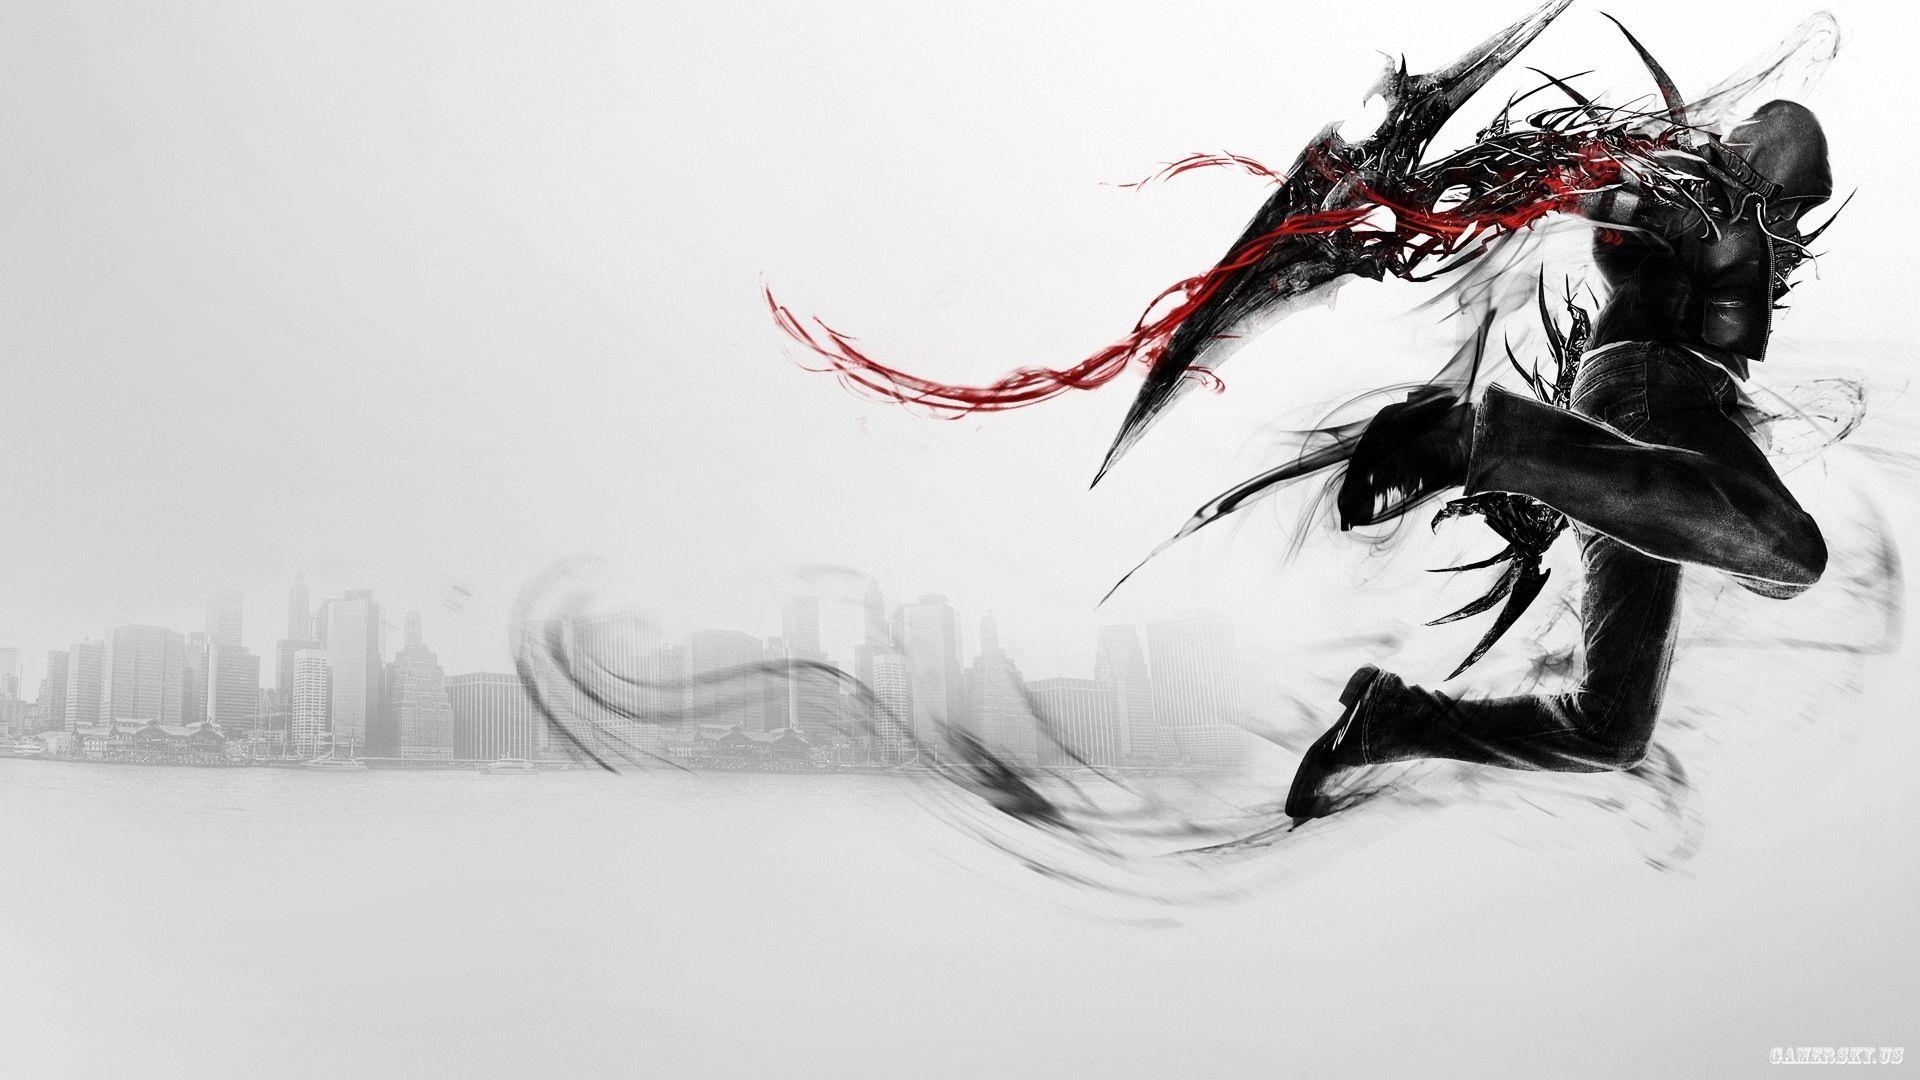 AssassinsCreed3wallpaper49